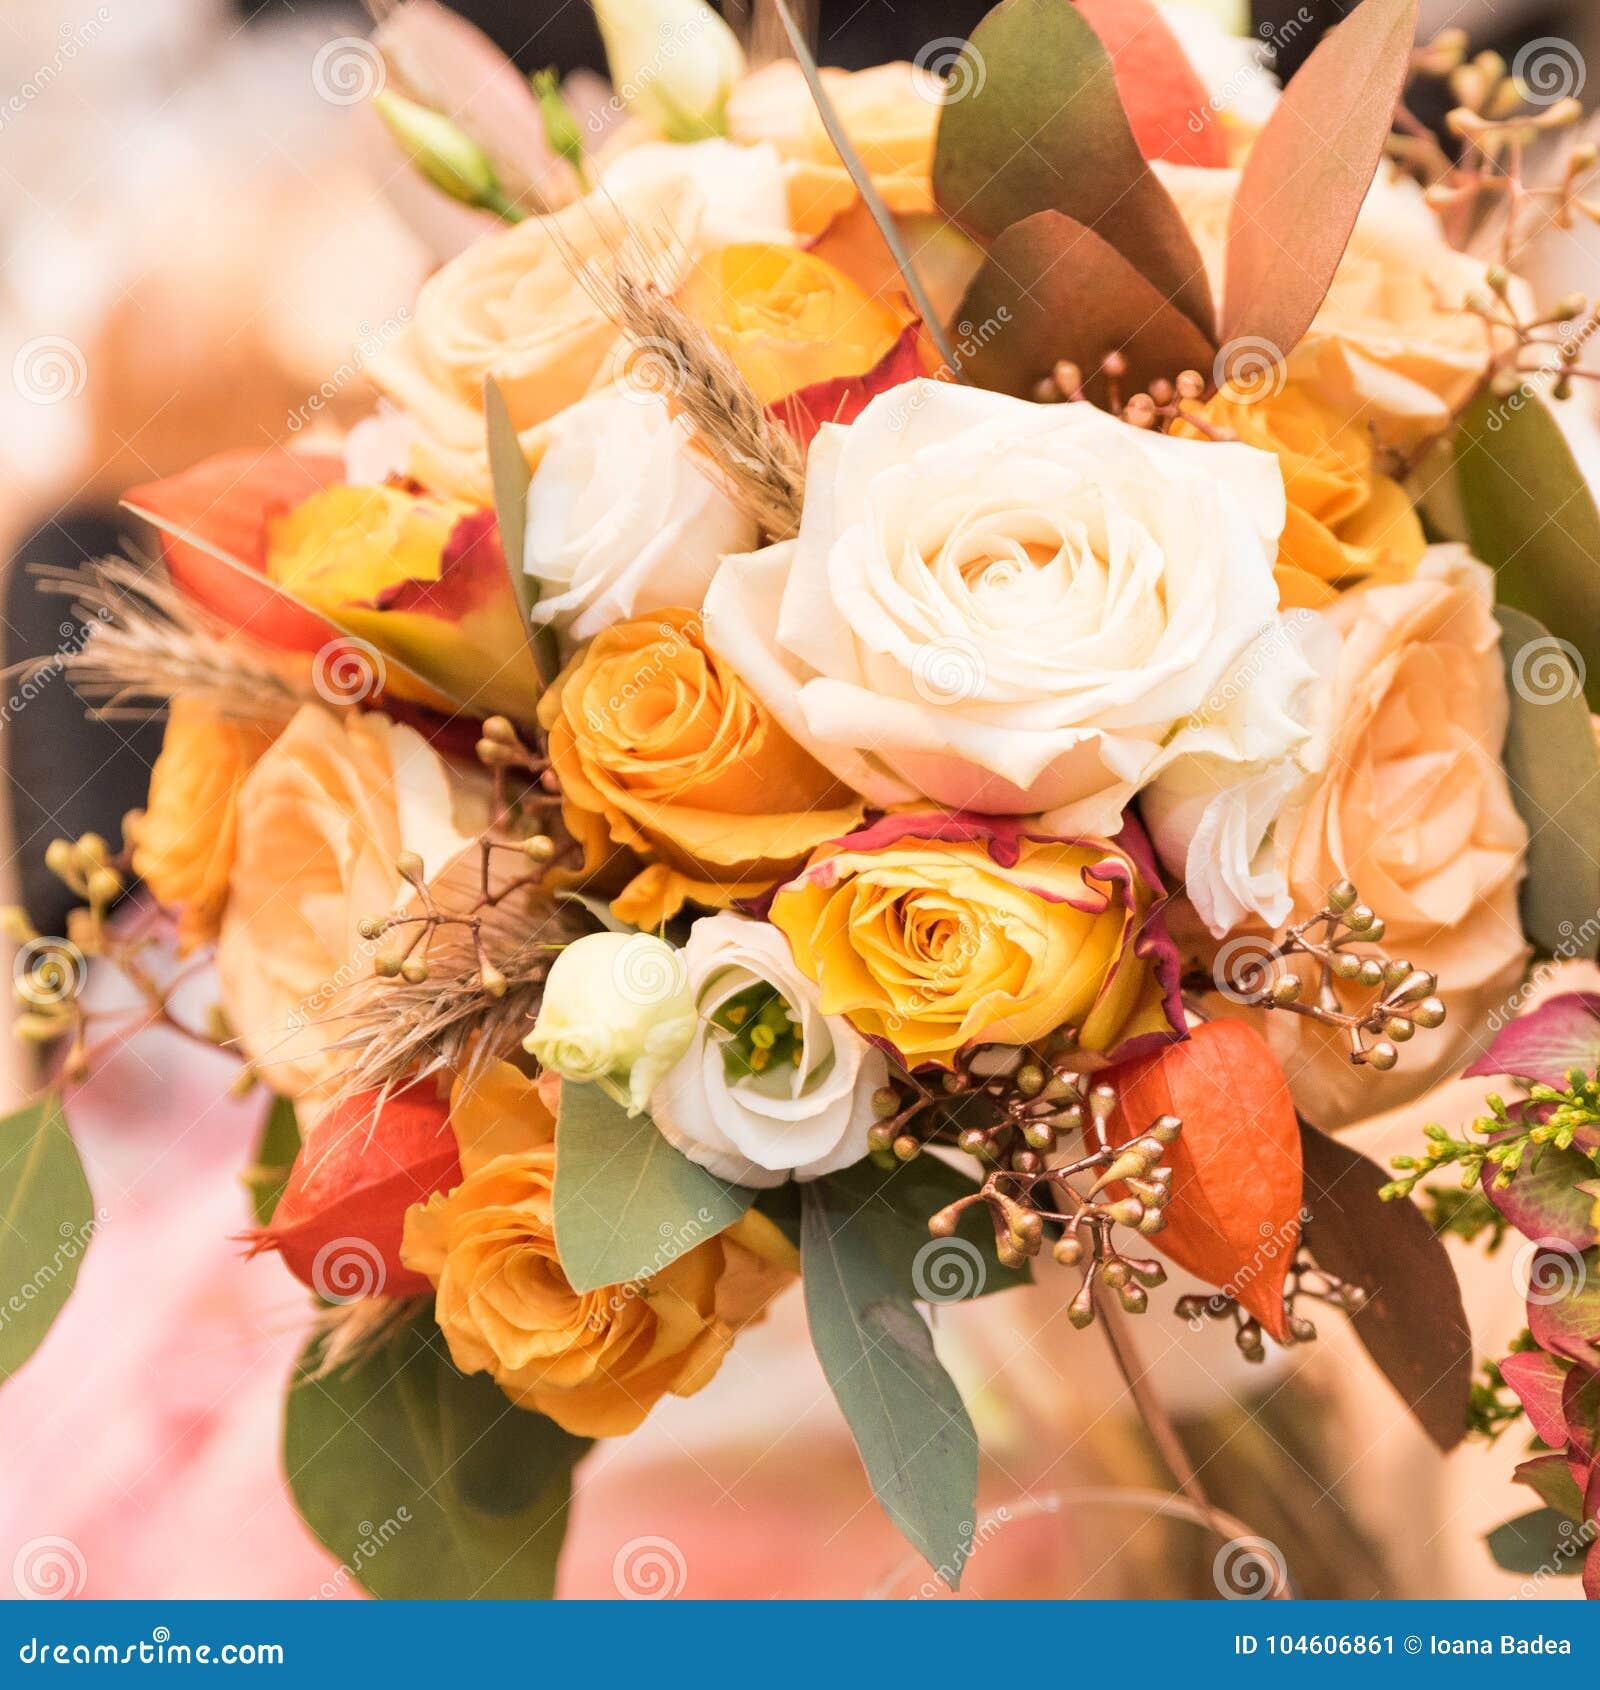 Wedding Flower Bouquet Decoration Stock Image Image Of Light